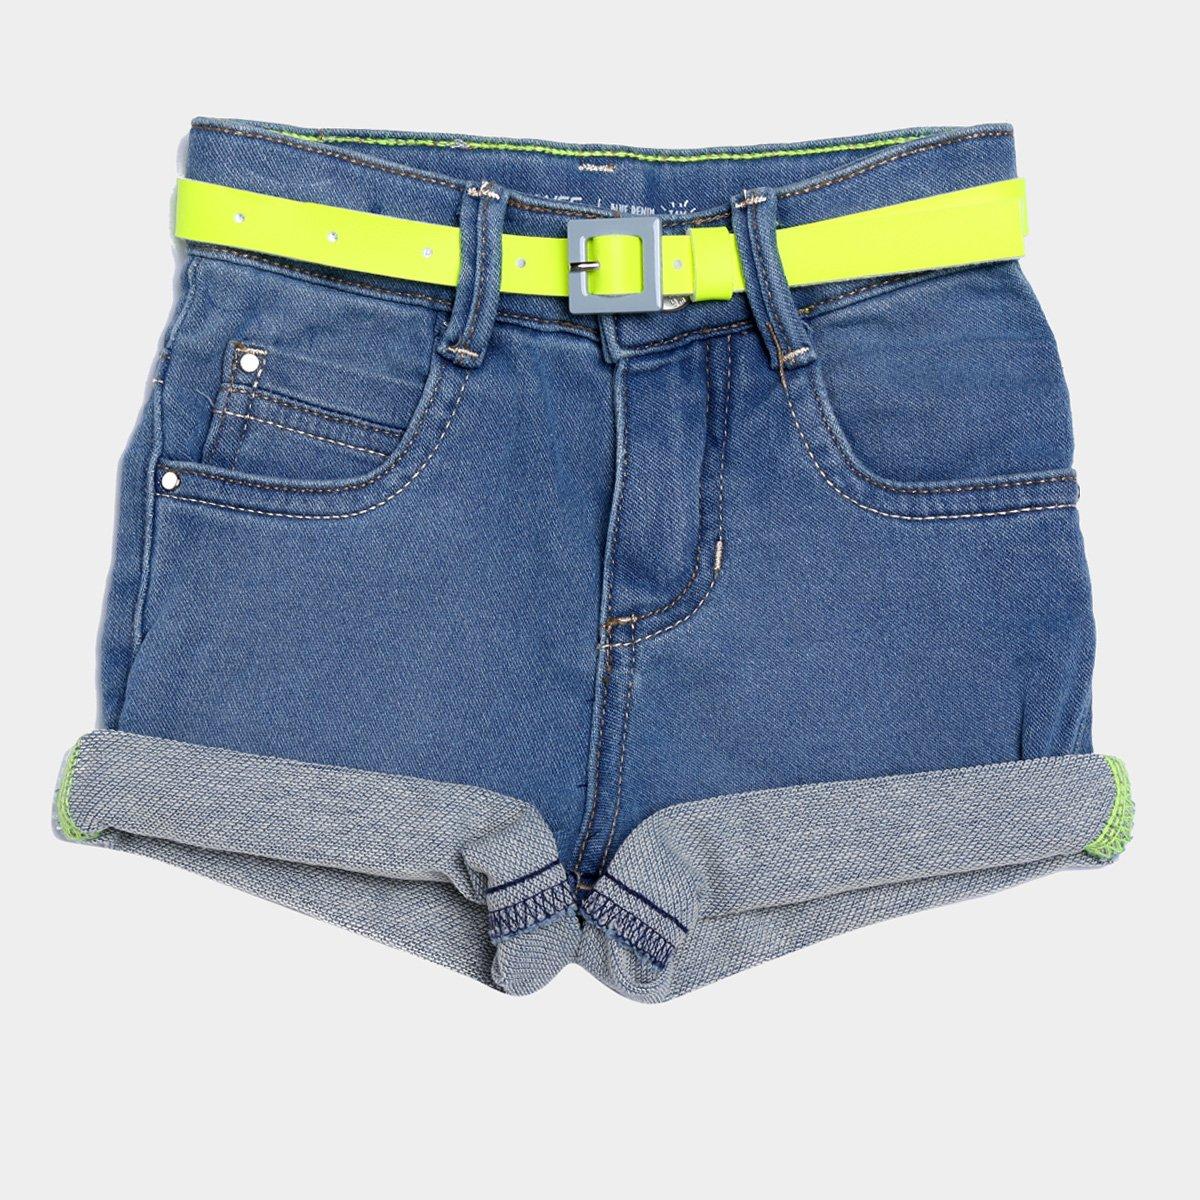 Shorts Jeans Juvenil Malwee Com Cinto Neon Feminino